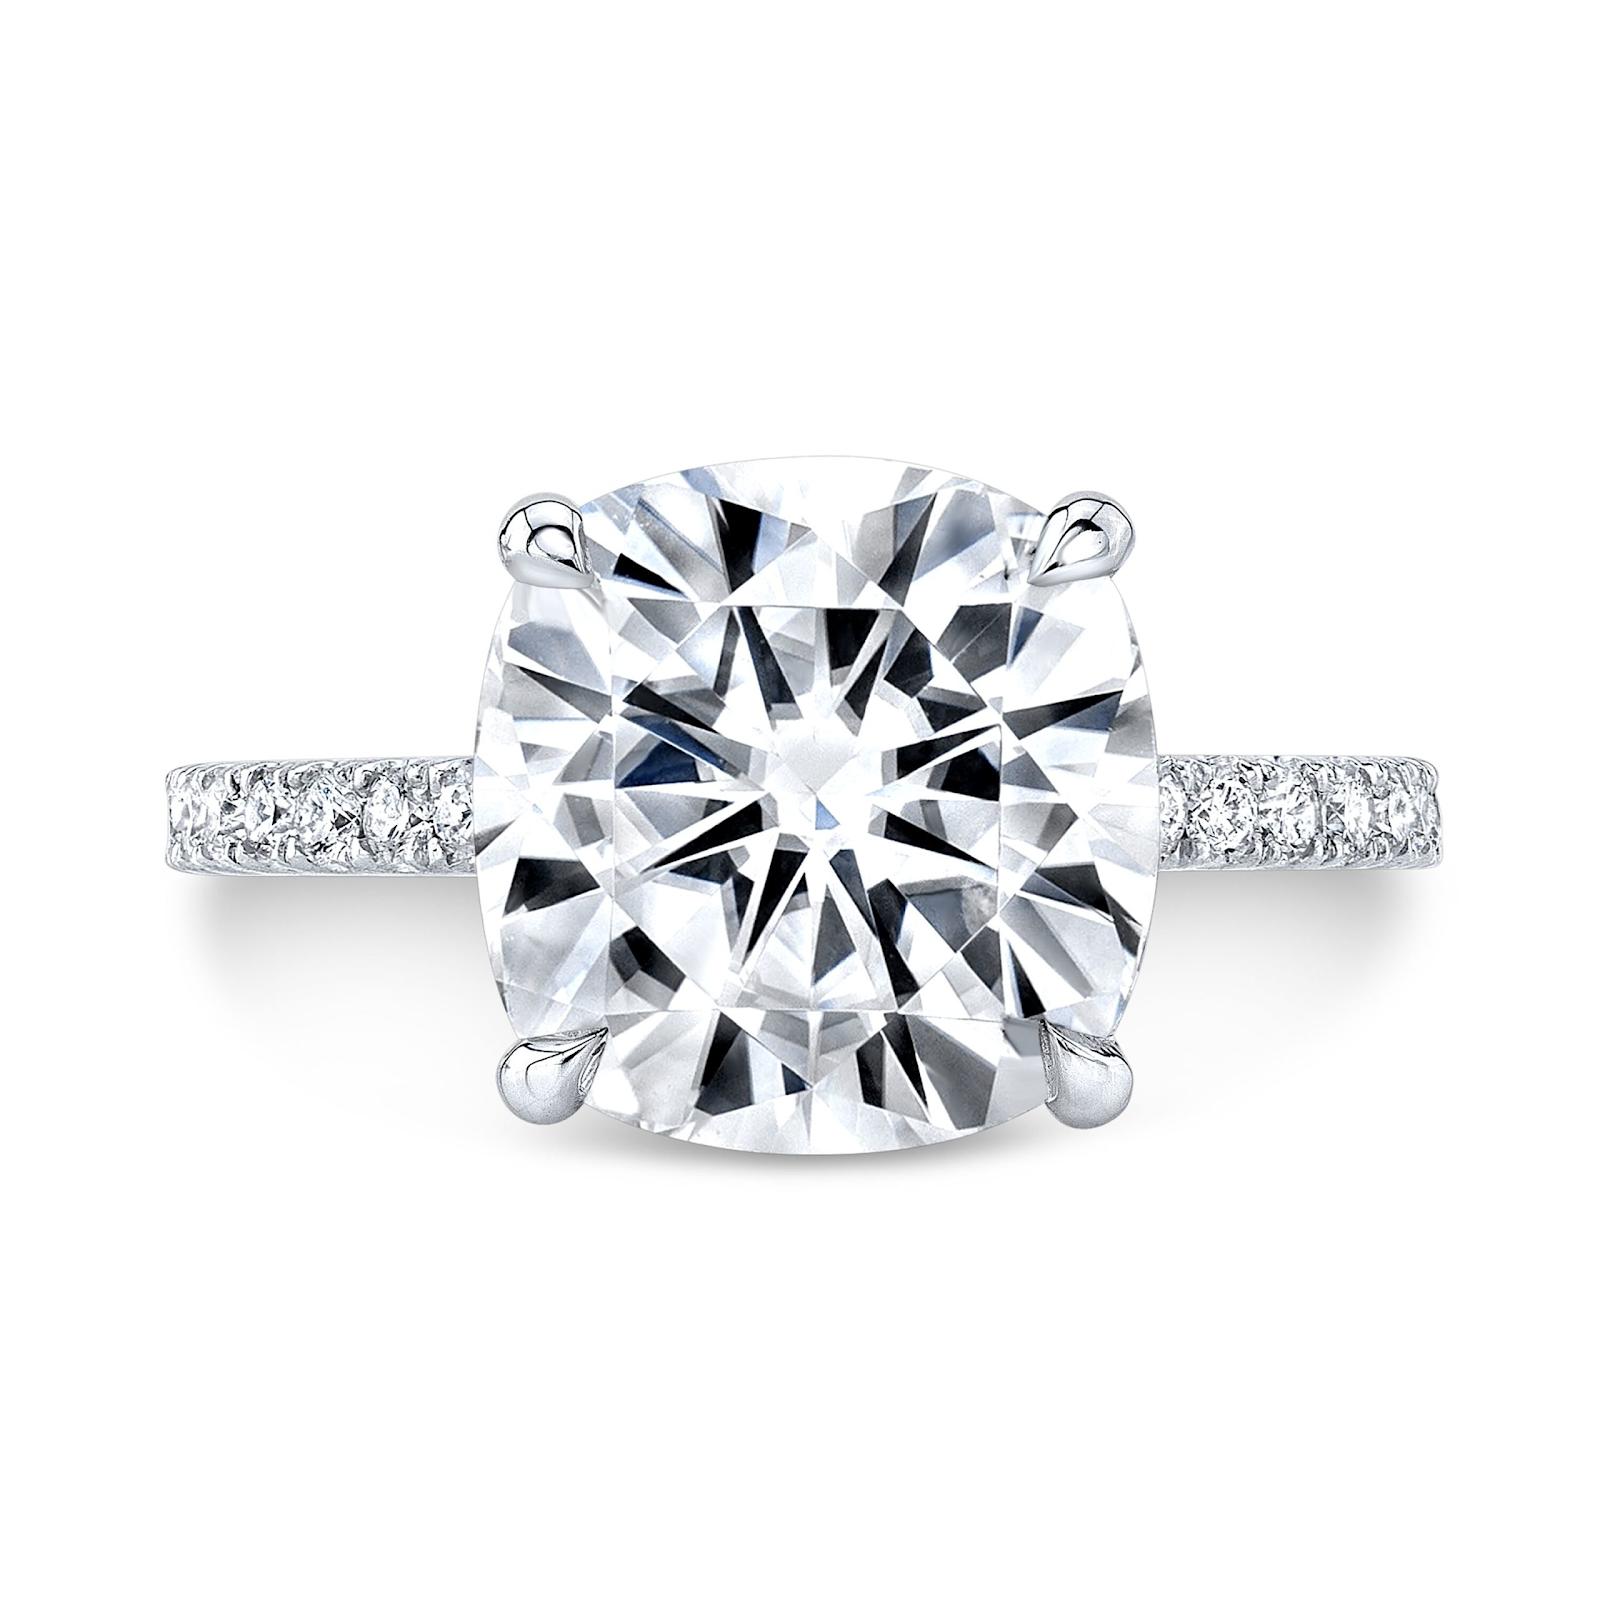 How to Buy Diamonds Like an Expert